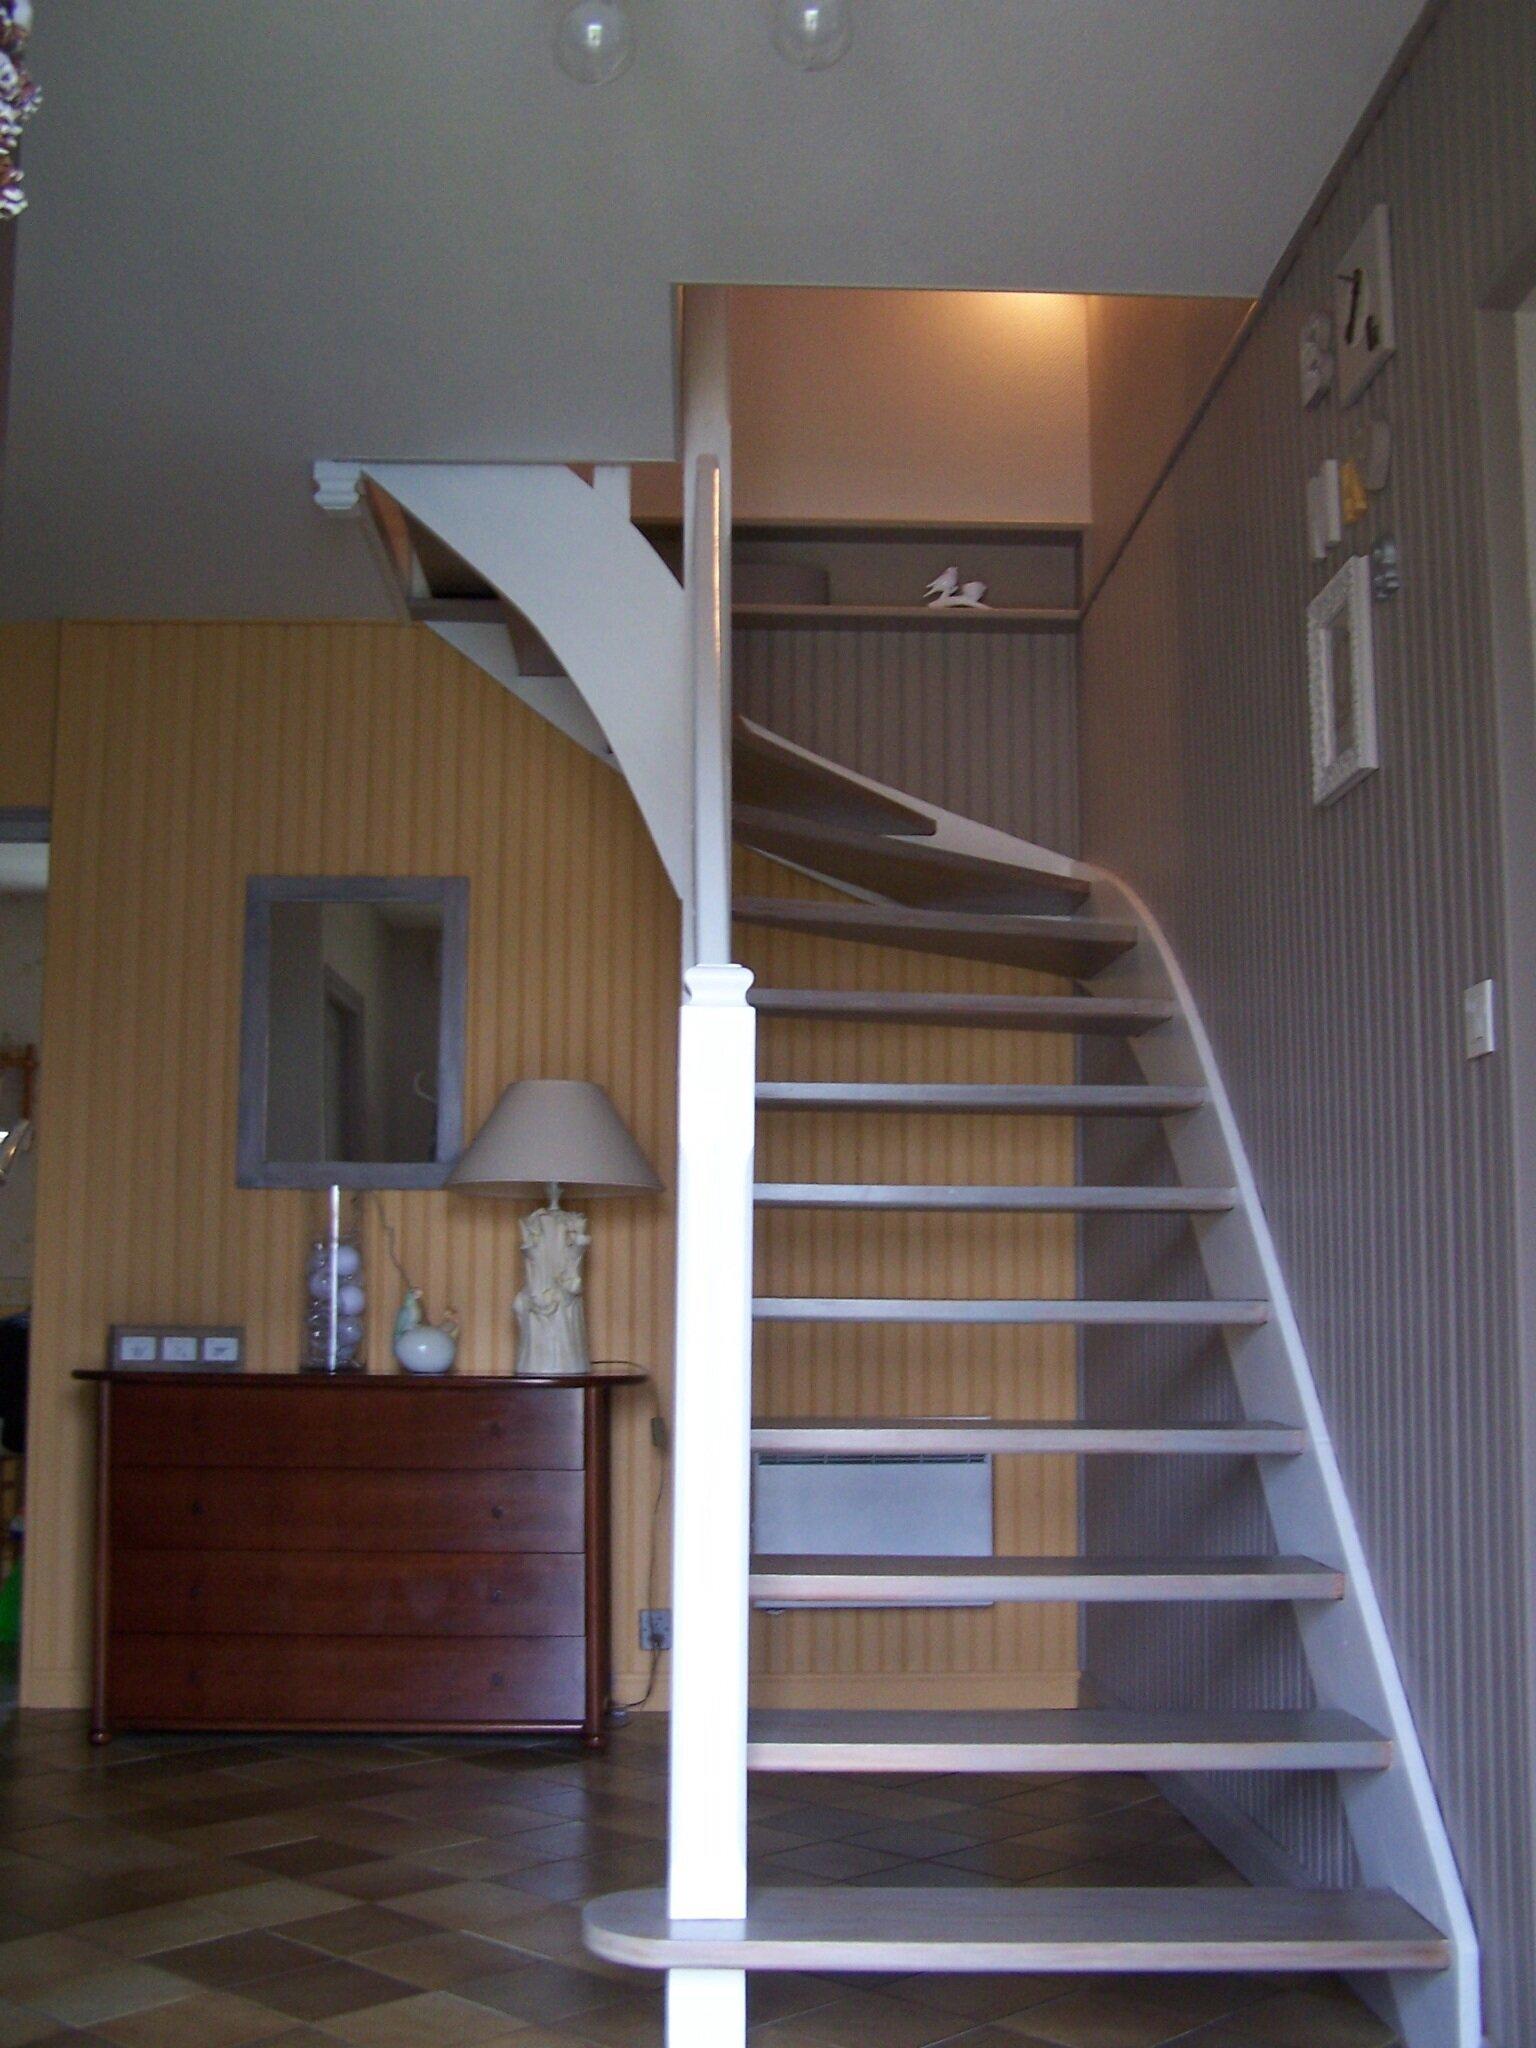 Relooking entr e avec escalier claudine br ger for Deco hall d entree avec escalier